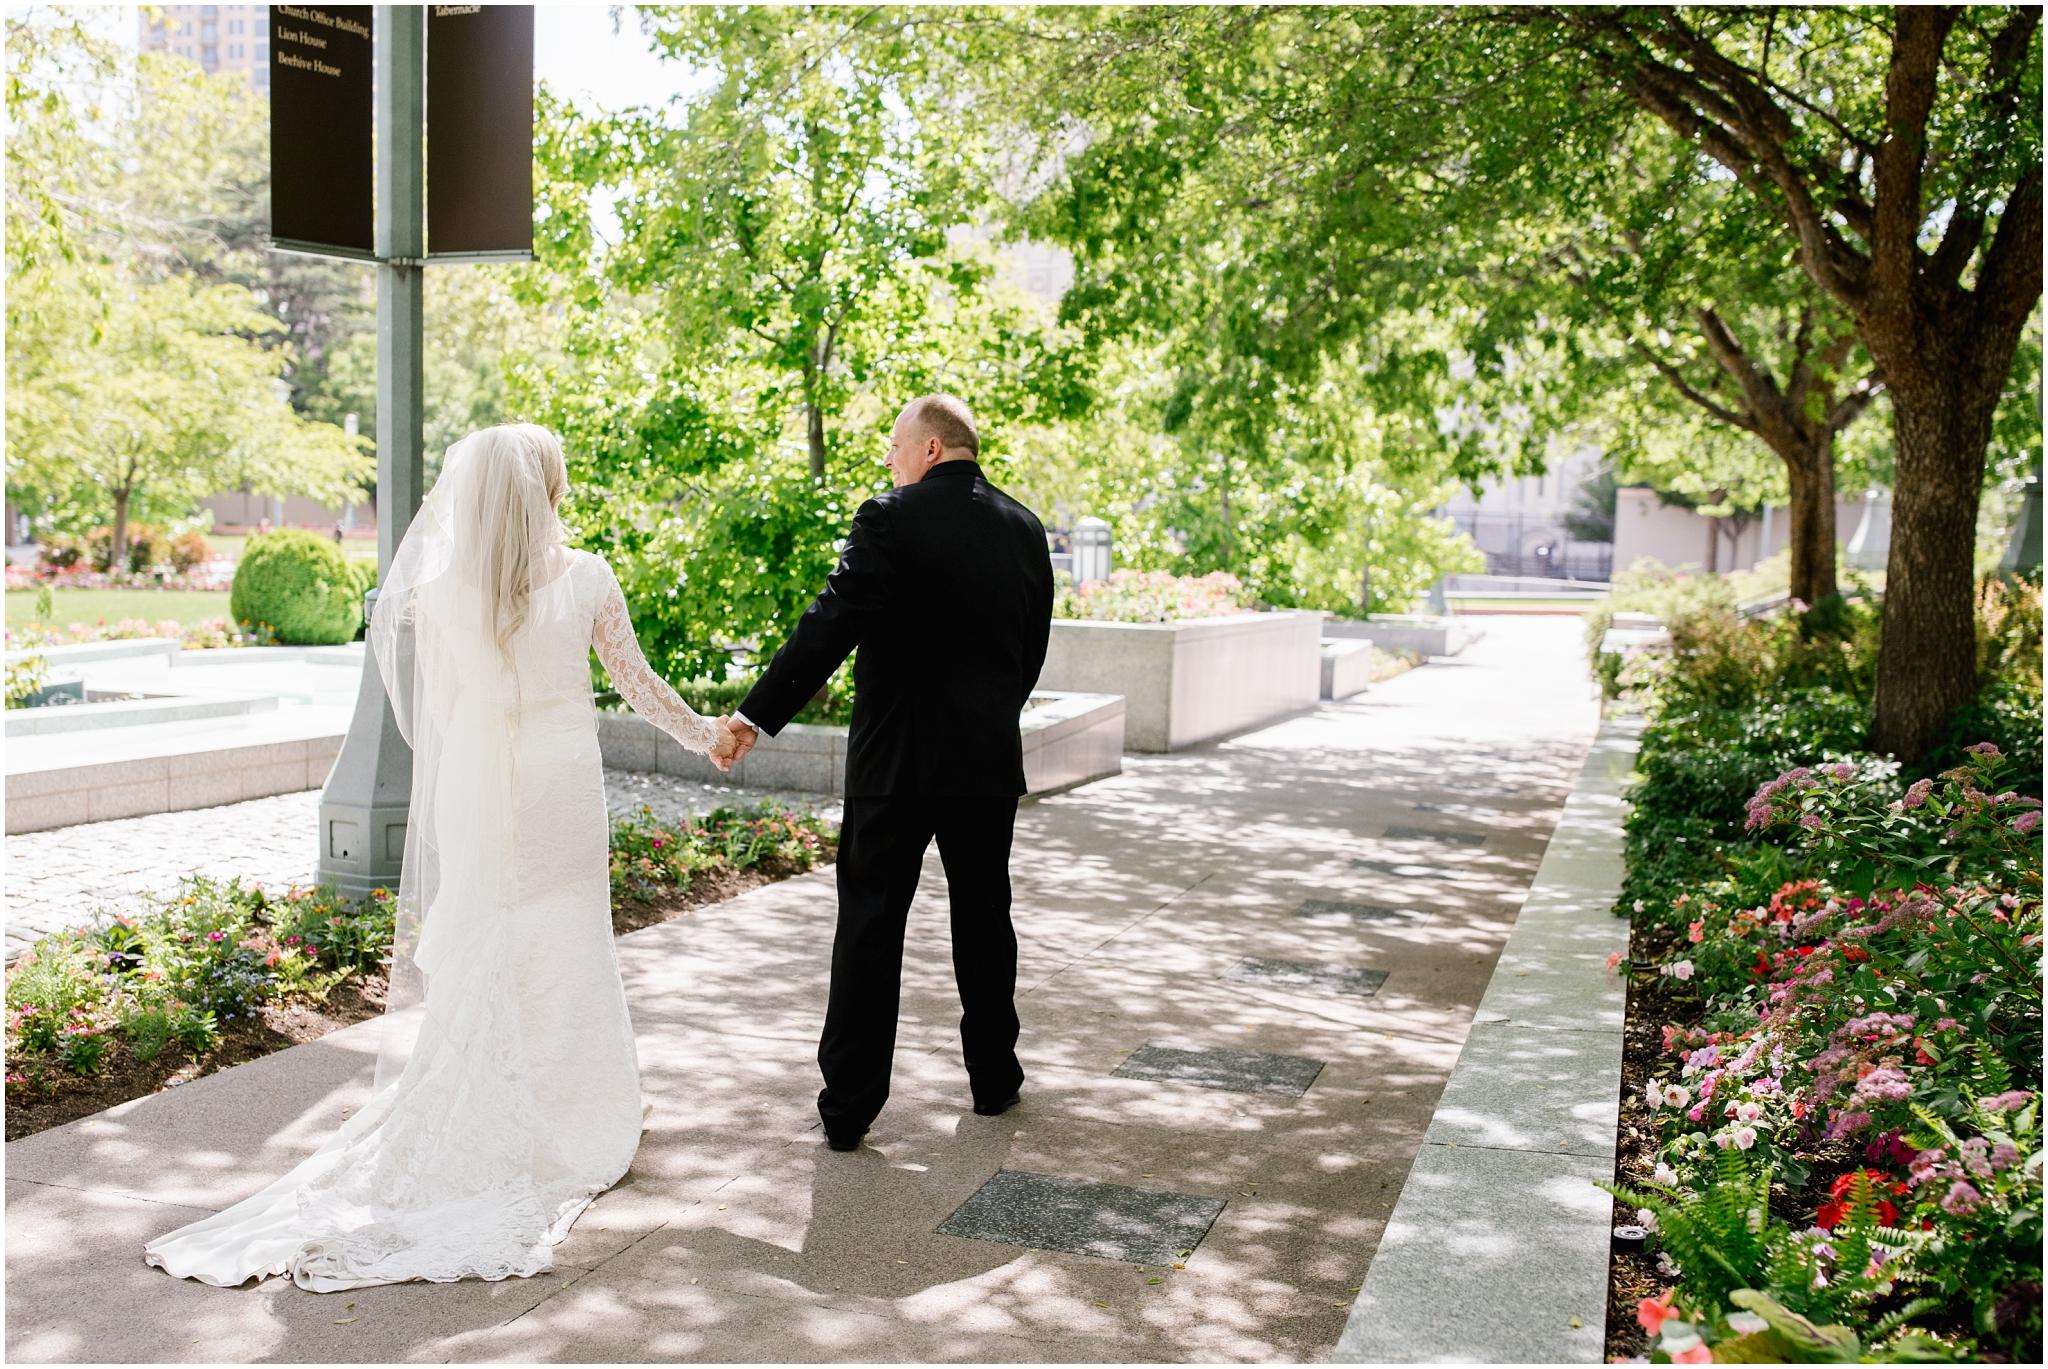 CherylandTyler-327_Lizzie-B-Imagery-Utah-Wedding-Photographer-Salt-Lake-City-Temple-Wells-Fargo-Building-Reception.jpg